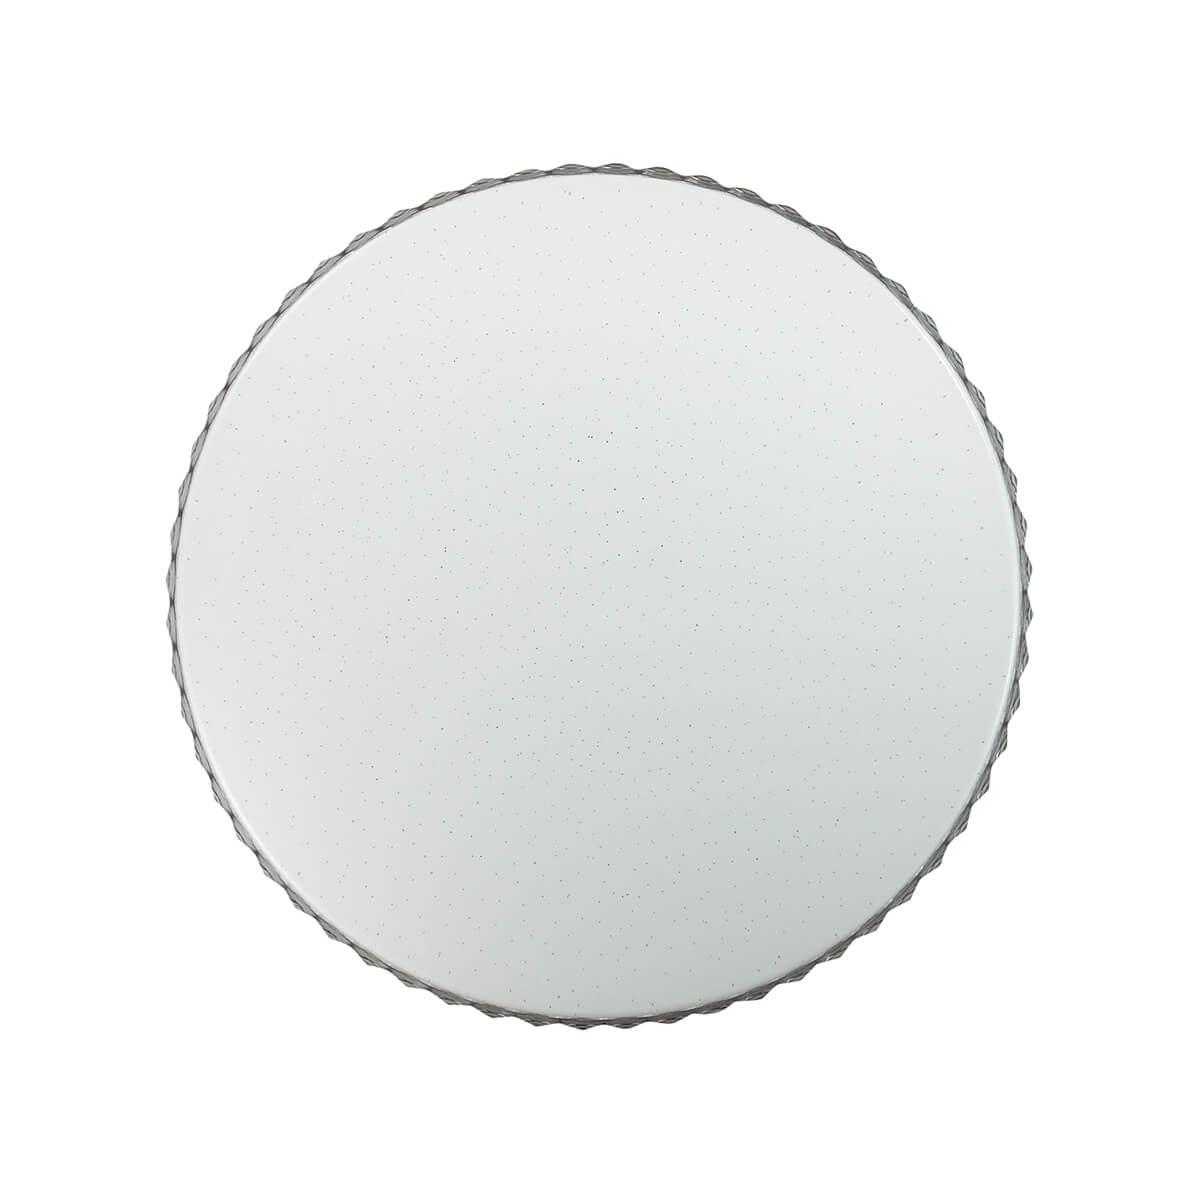 Светильник Sonex 2077/EL светильник sonex 2049 el